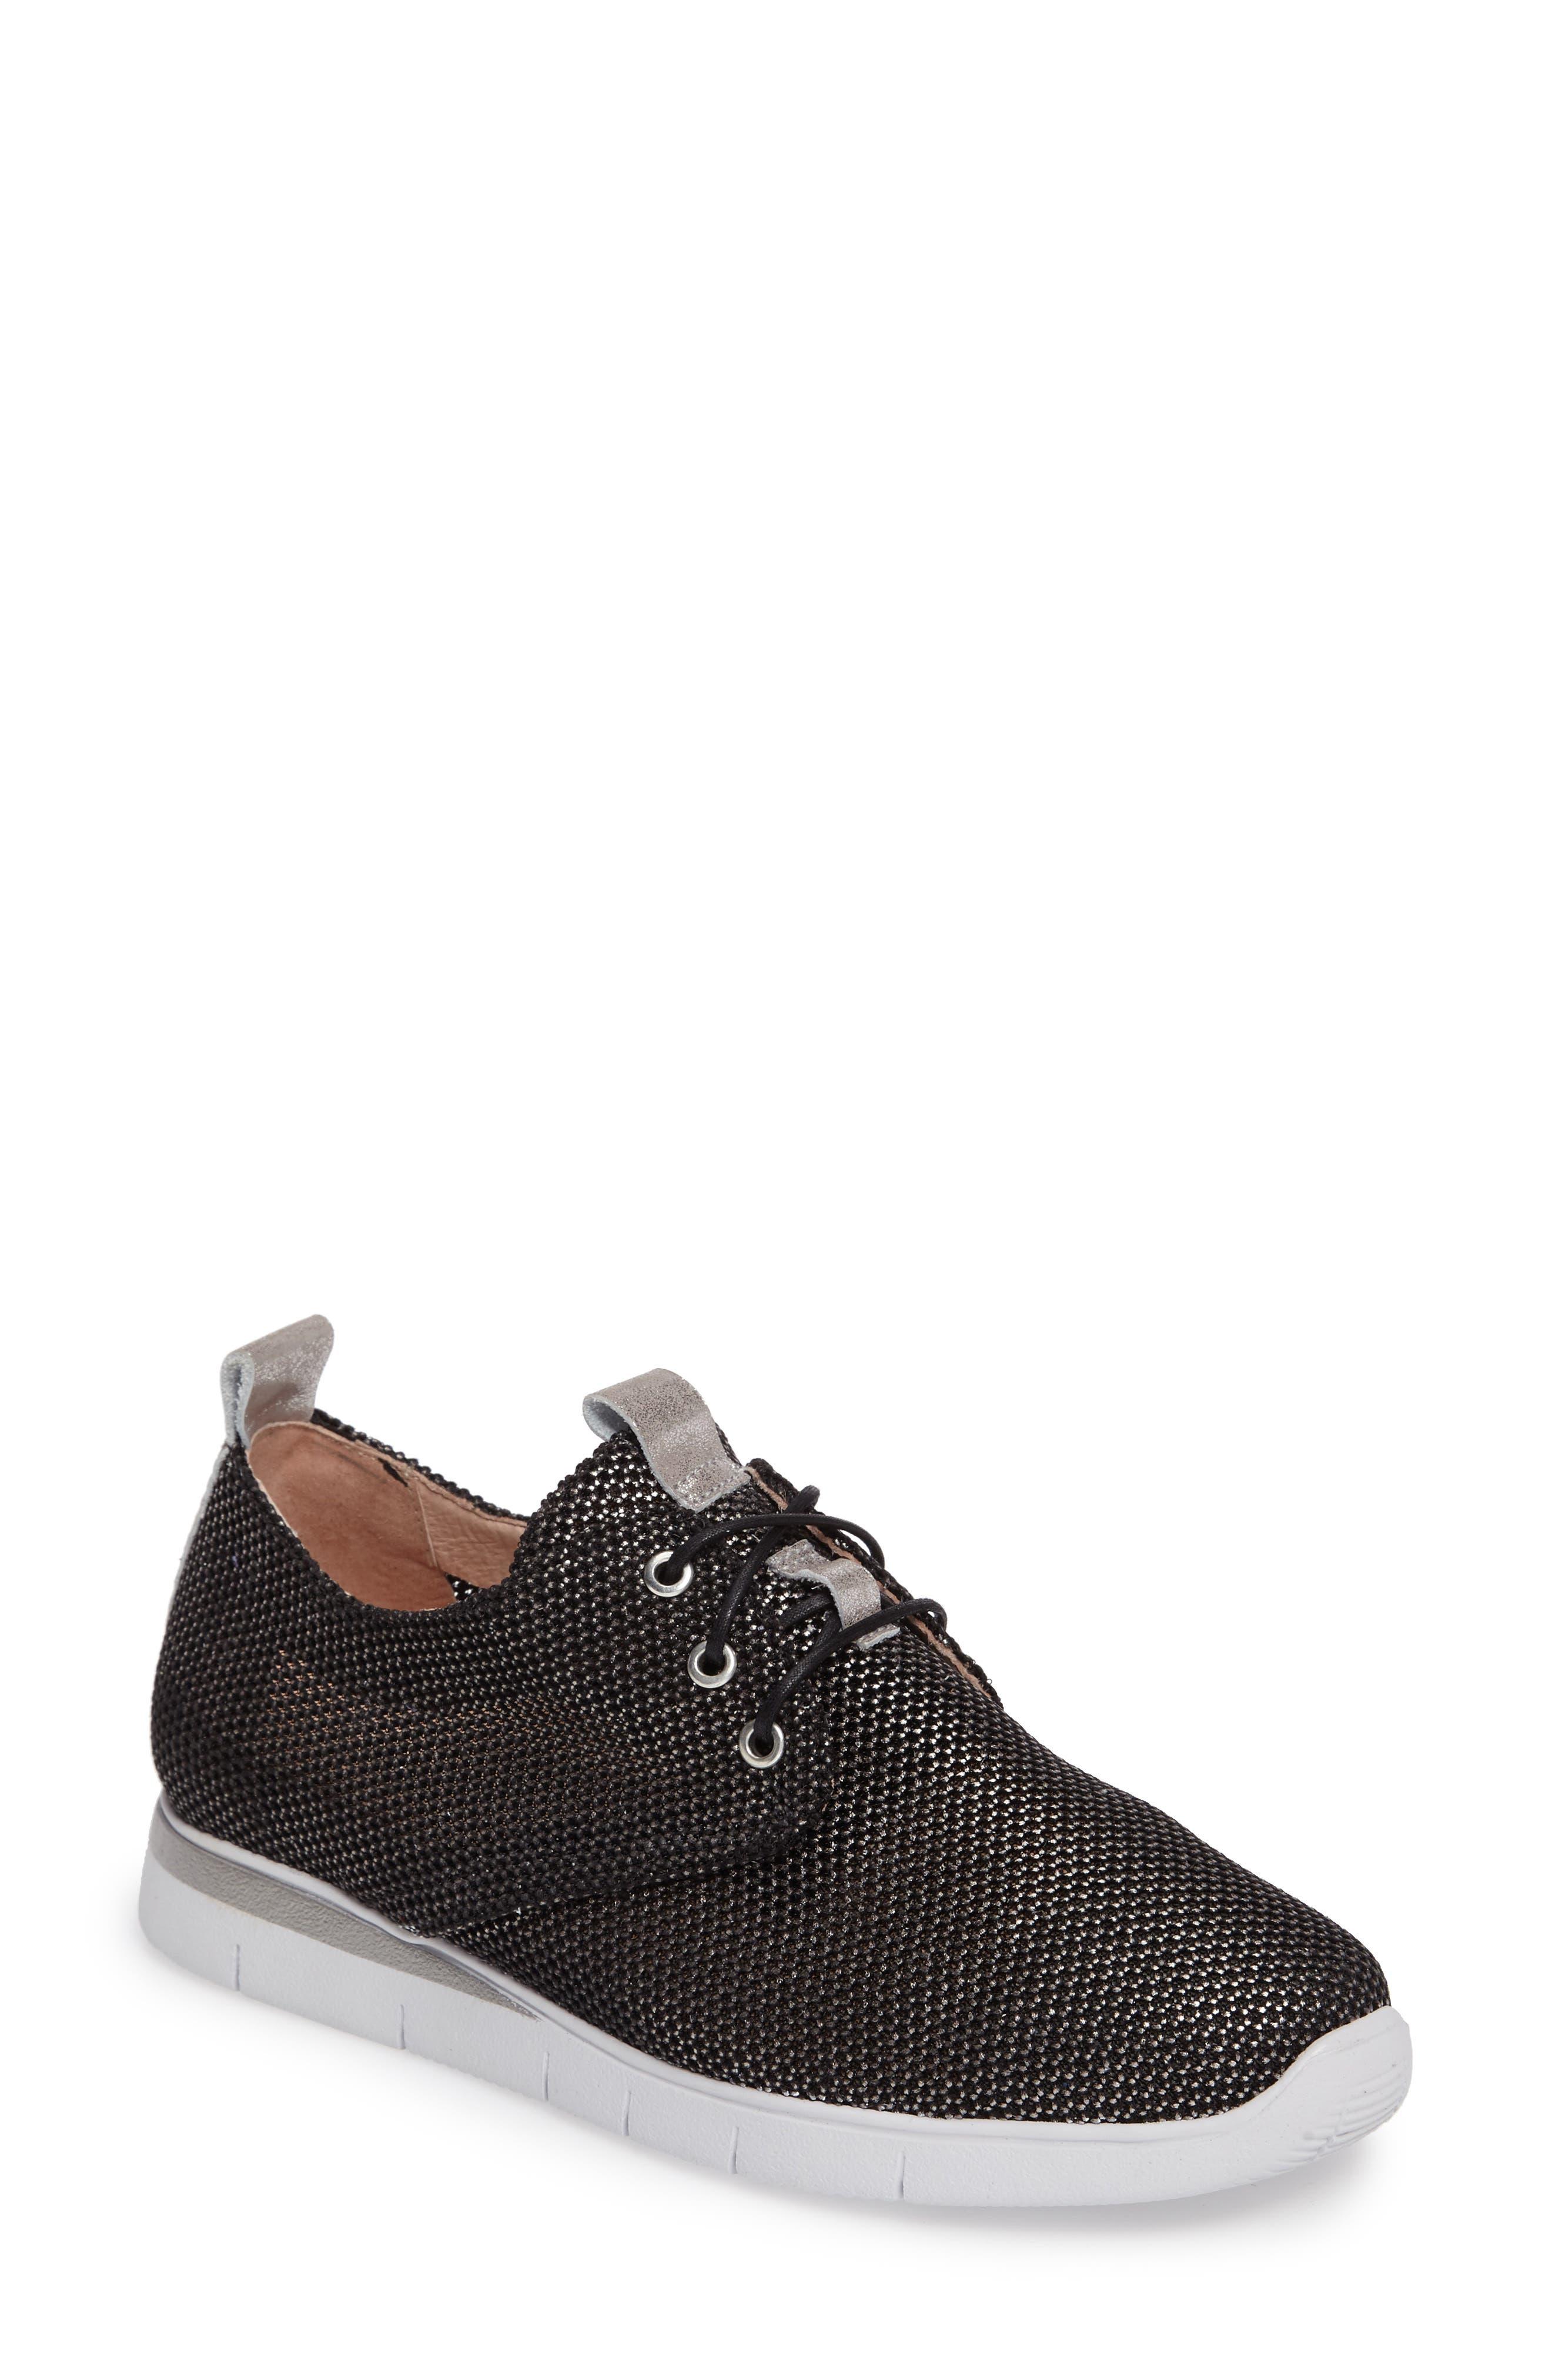 Gala Perforated Sneaker,                             Main thumbnail 1, color,                             001